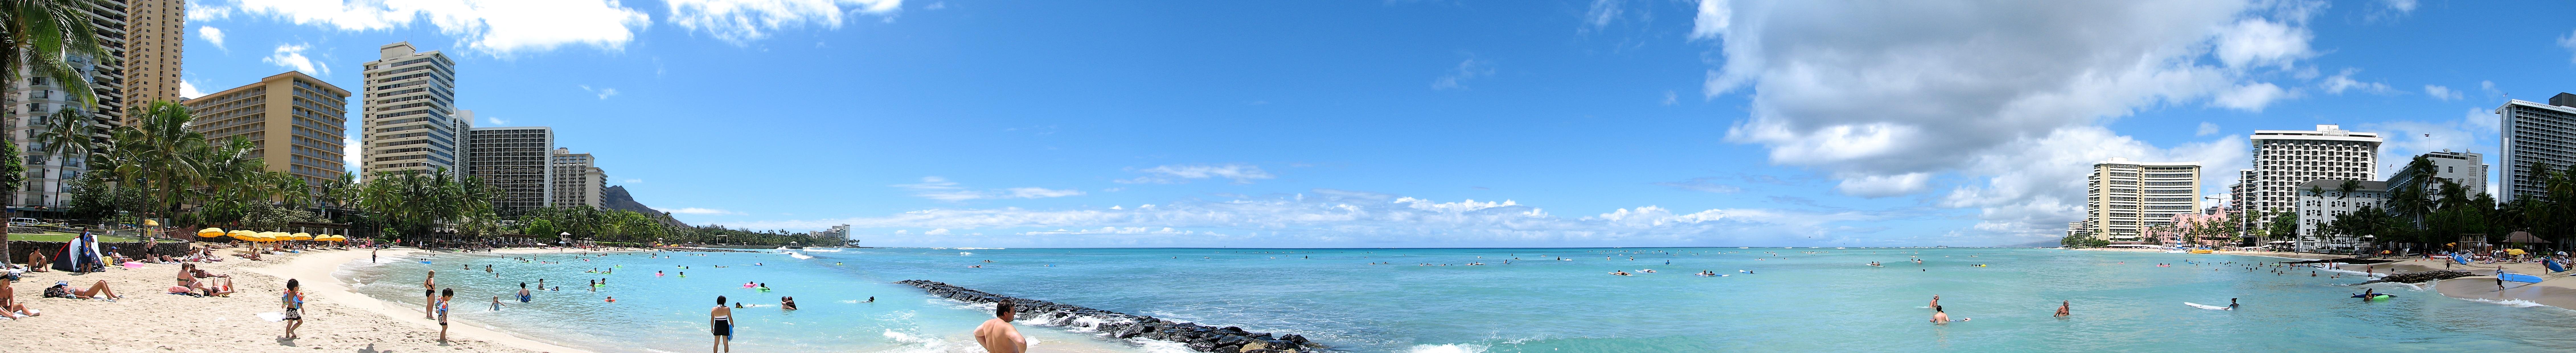 Is Waikiki On The Big Island